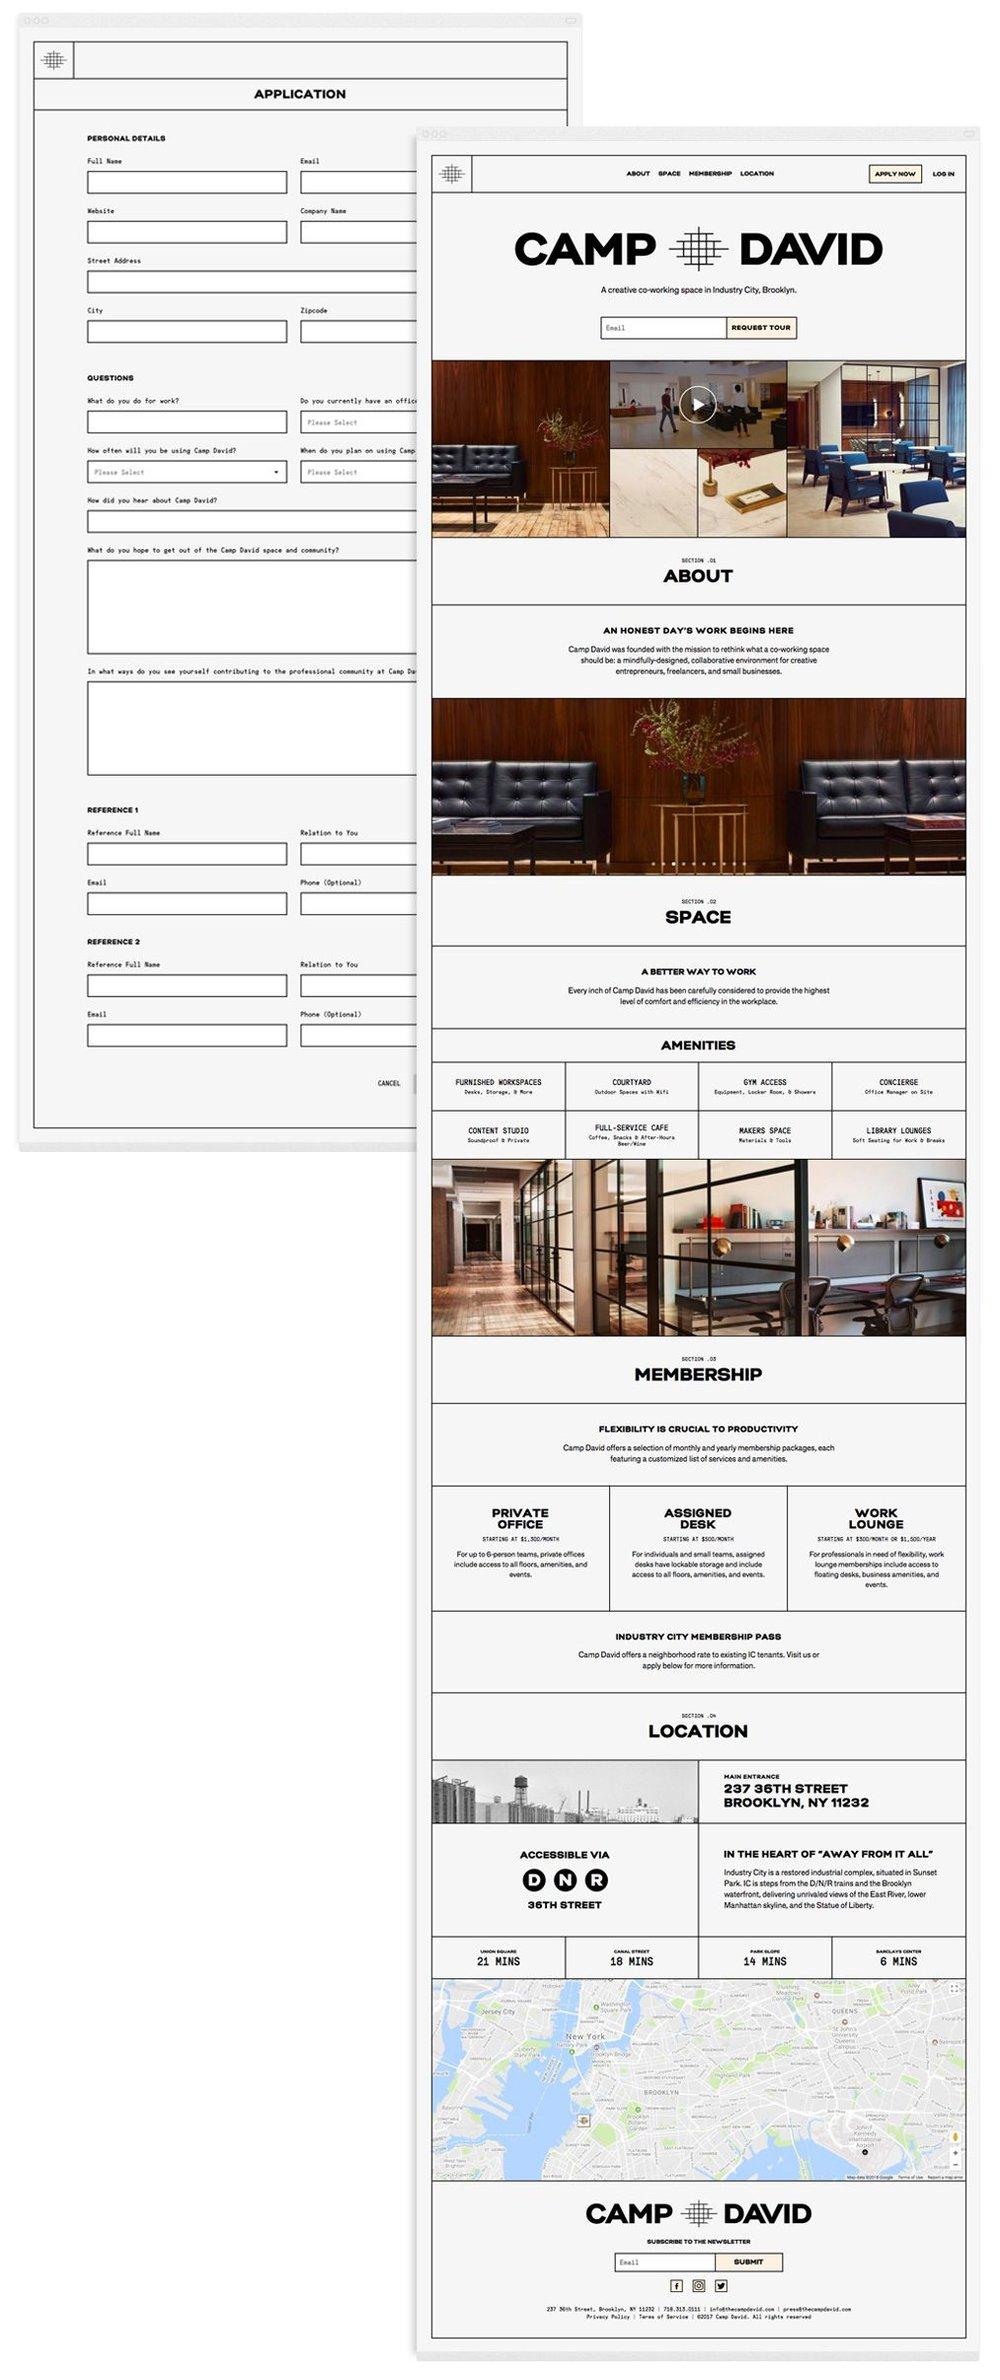 zmaic-milk-camp-david-ui-ux-web-design-marketing-site.jpg